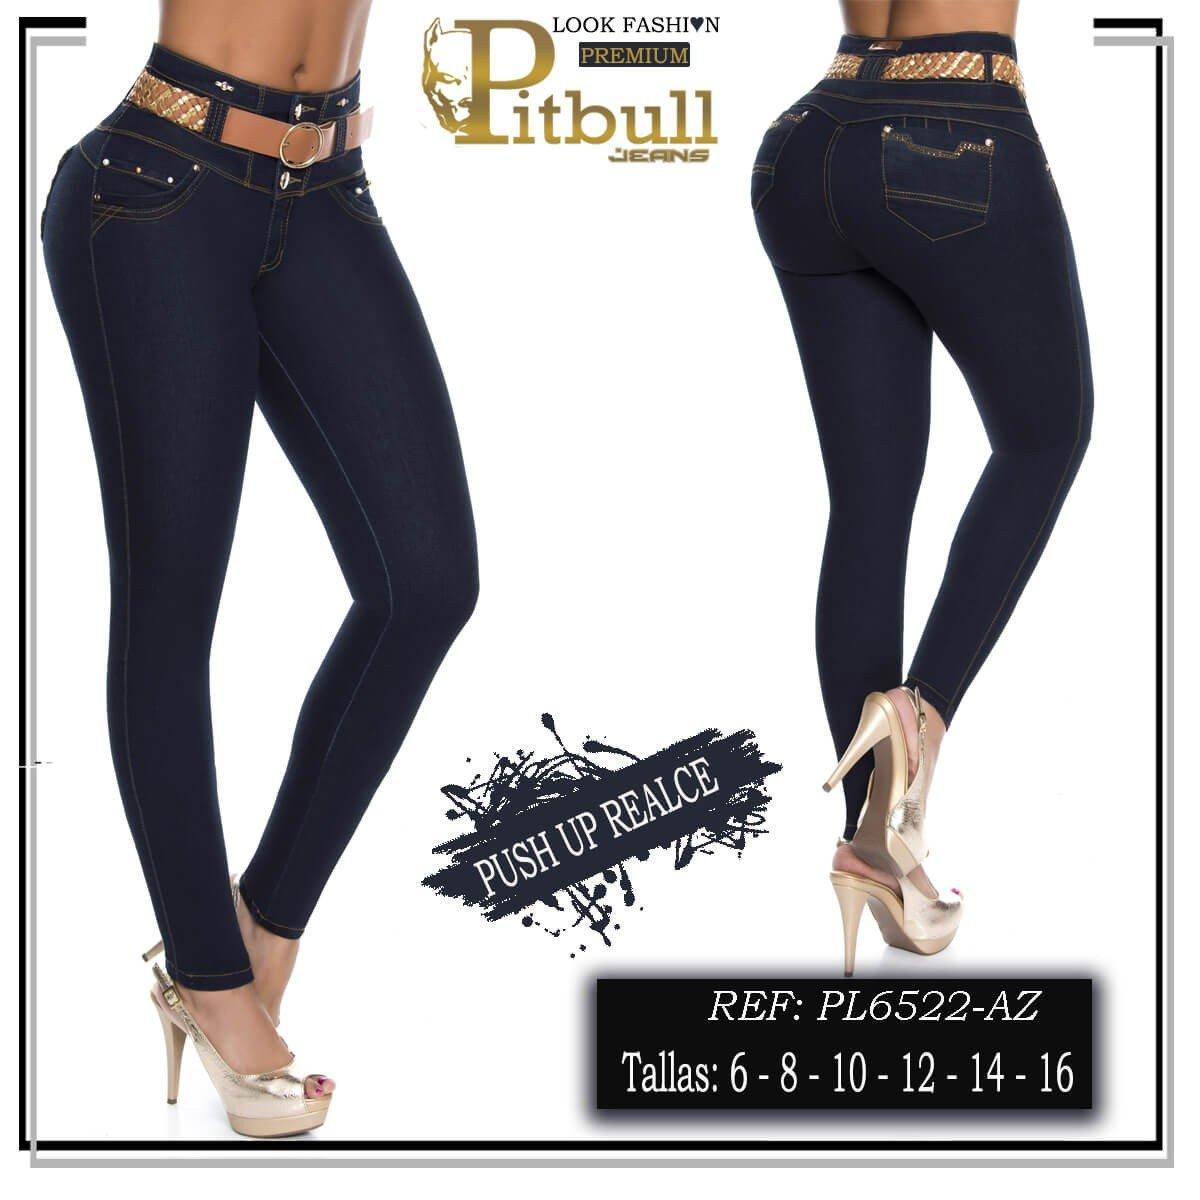 pantalon-colombiano-pitbull-jeans-pl6522_2